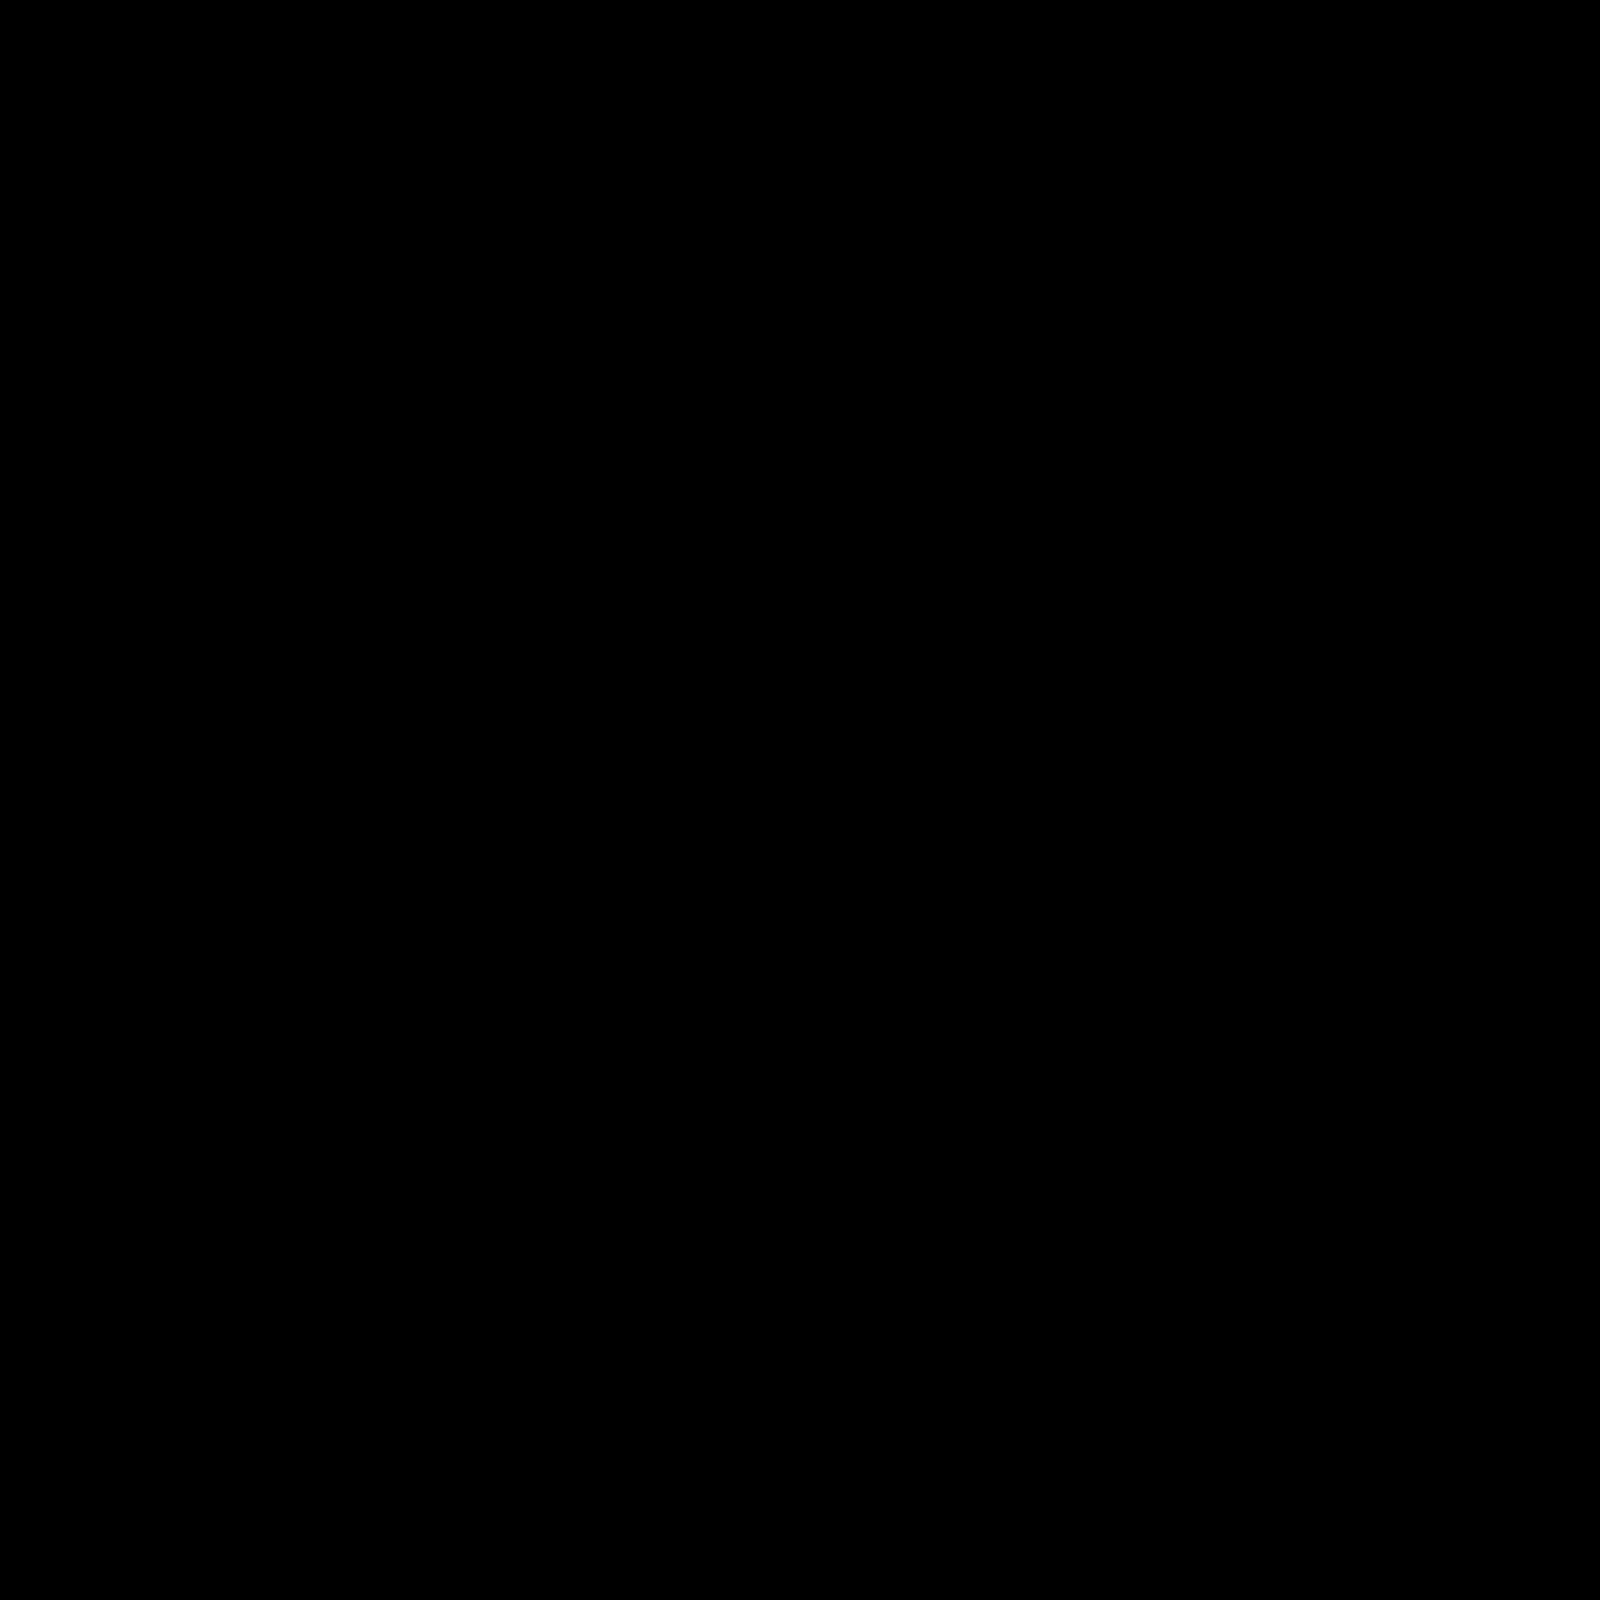 X image png 5 » PNG Image.